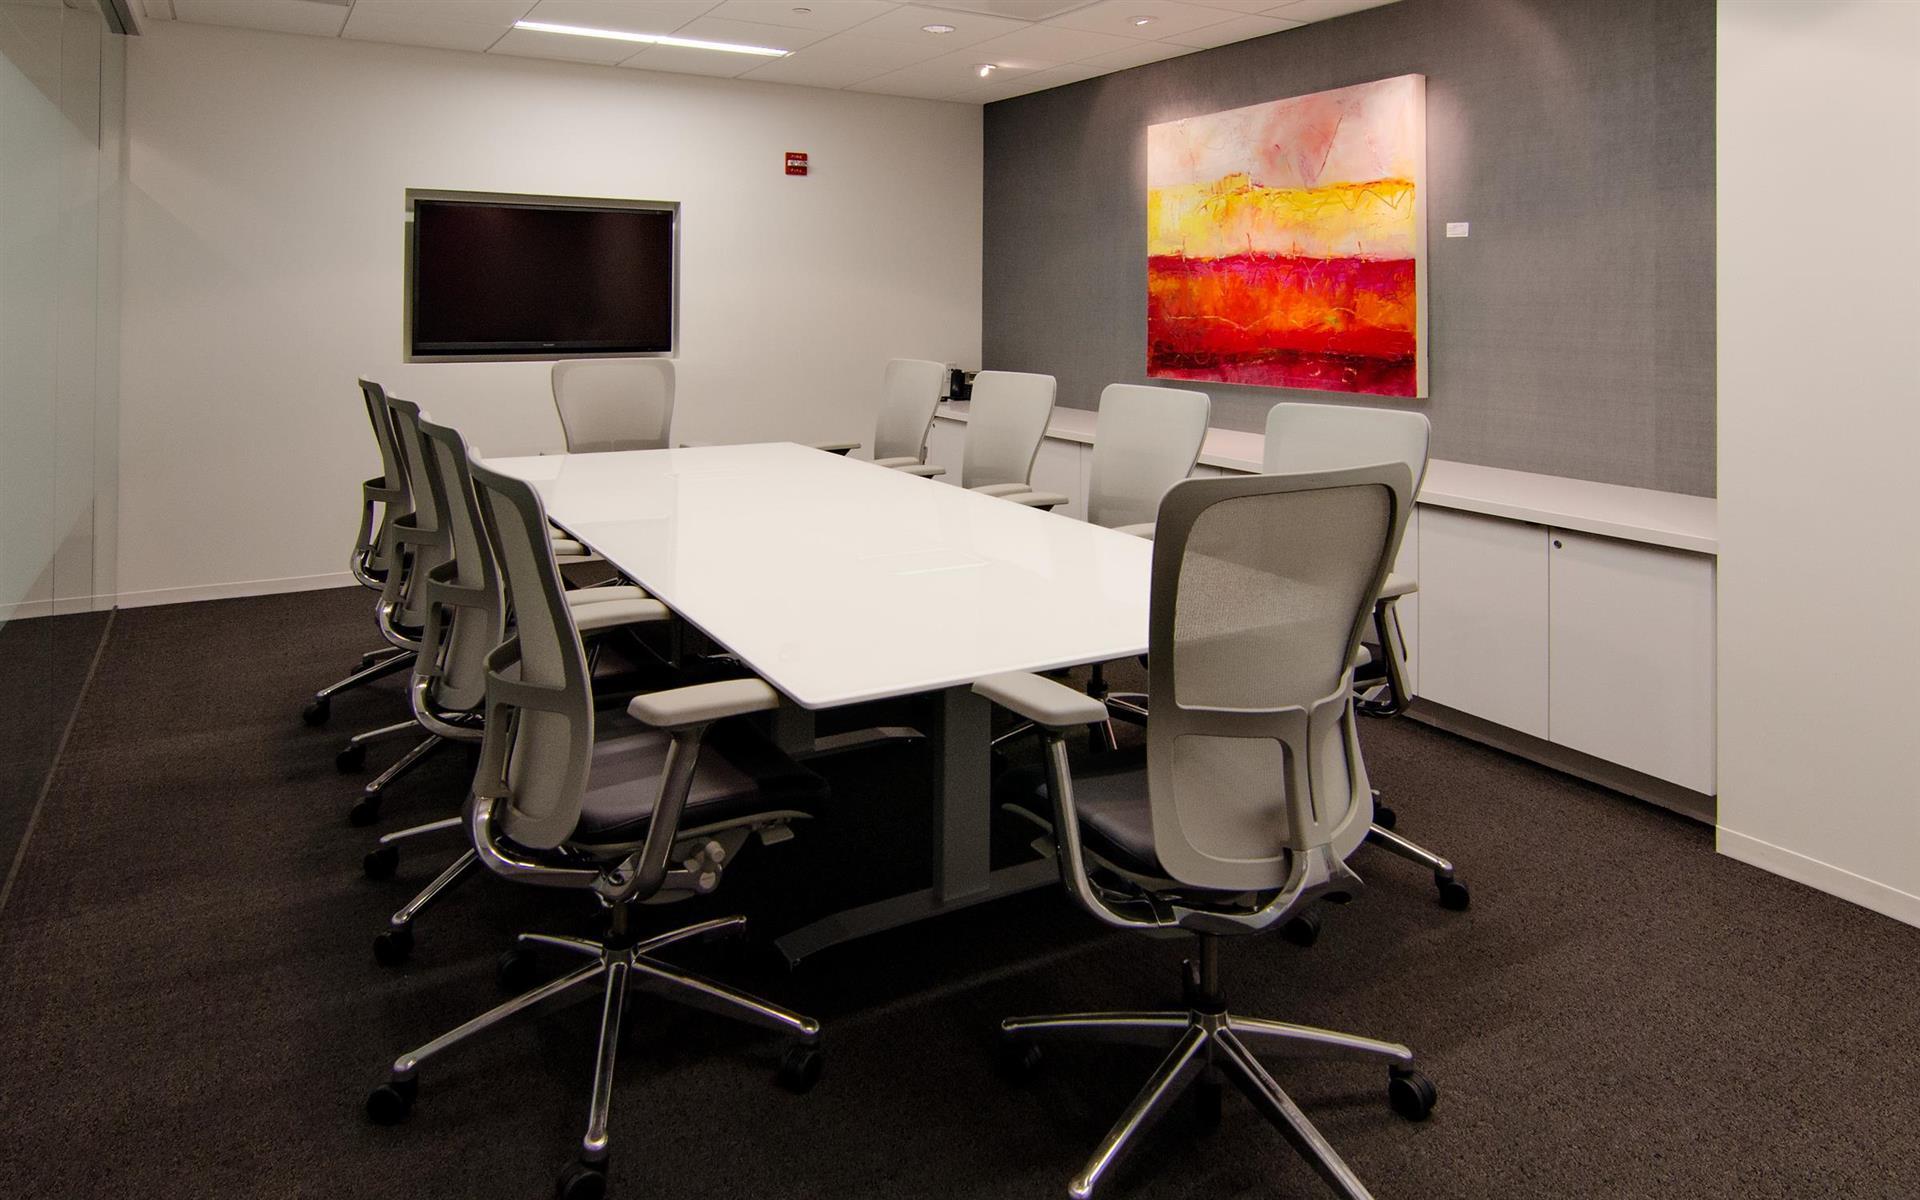 AdvantEdge BC - Downtown Center - Conference Room #4, Suite 440